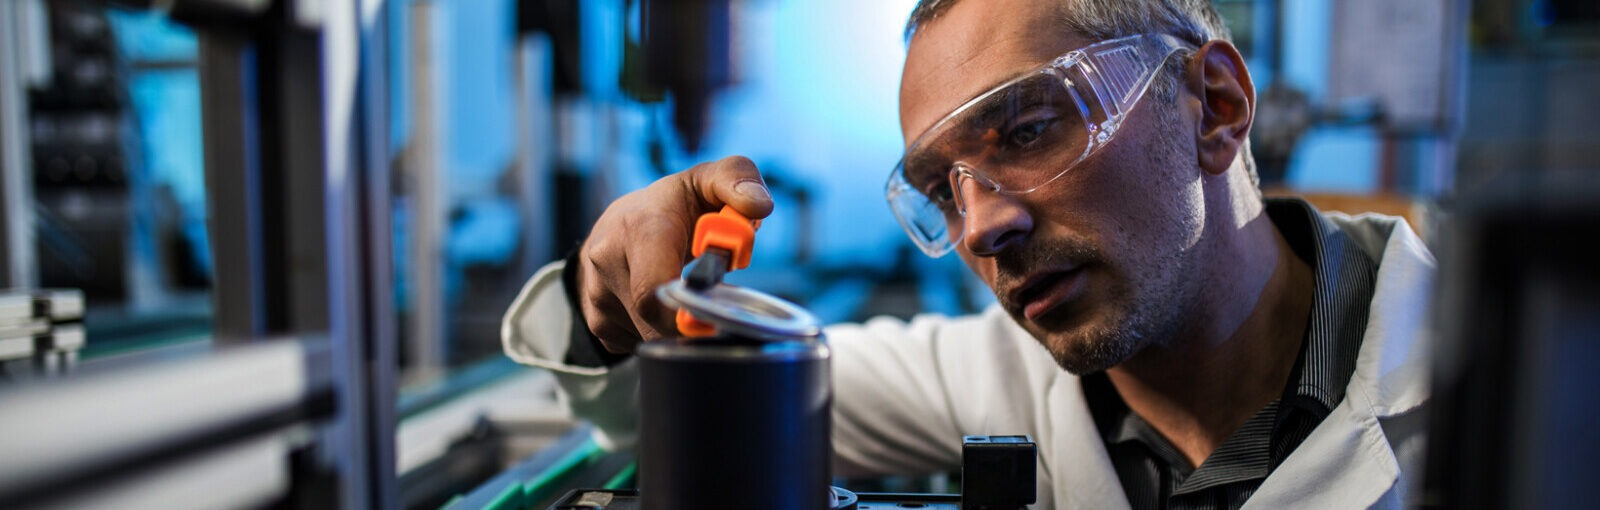 Primetake Research and Development Testing